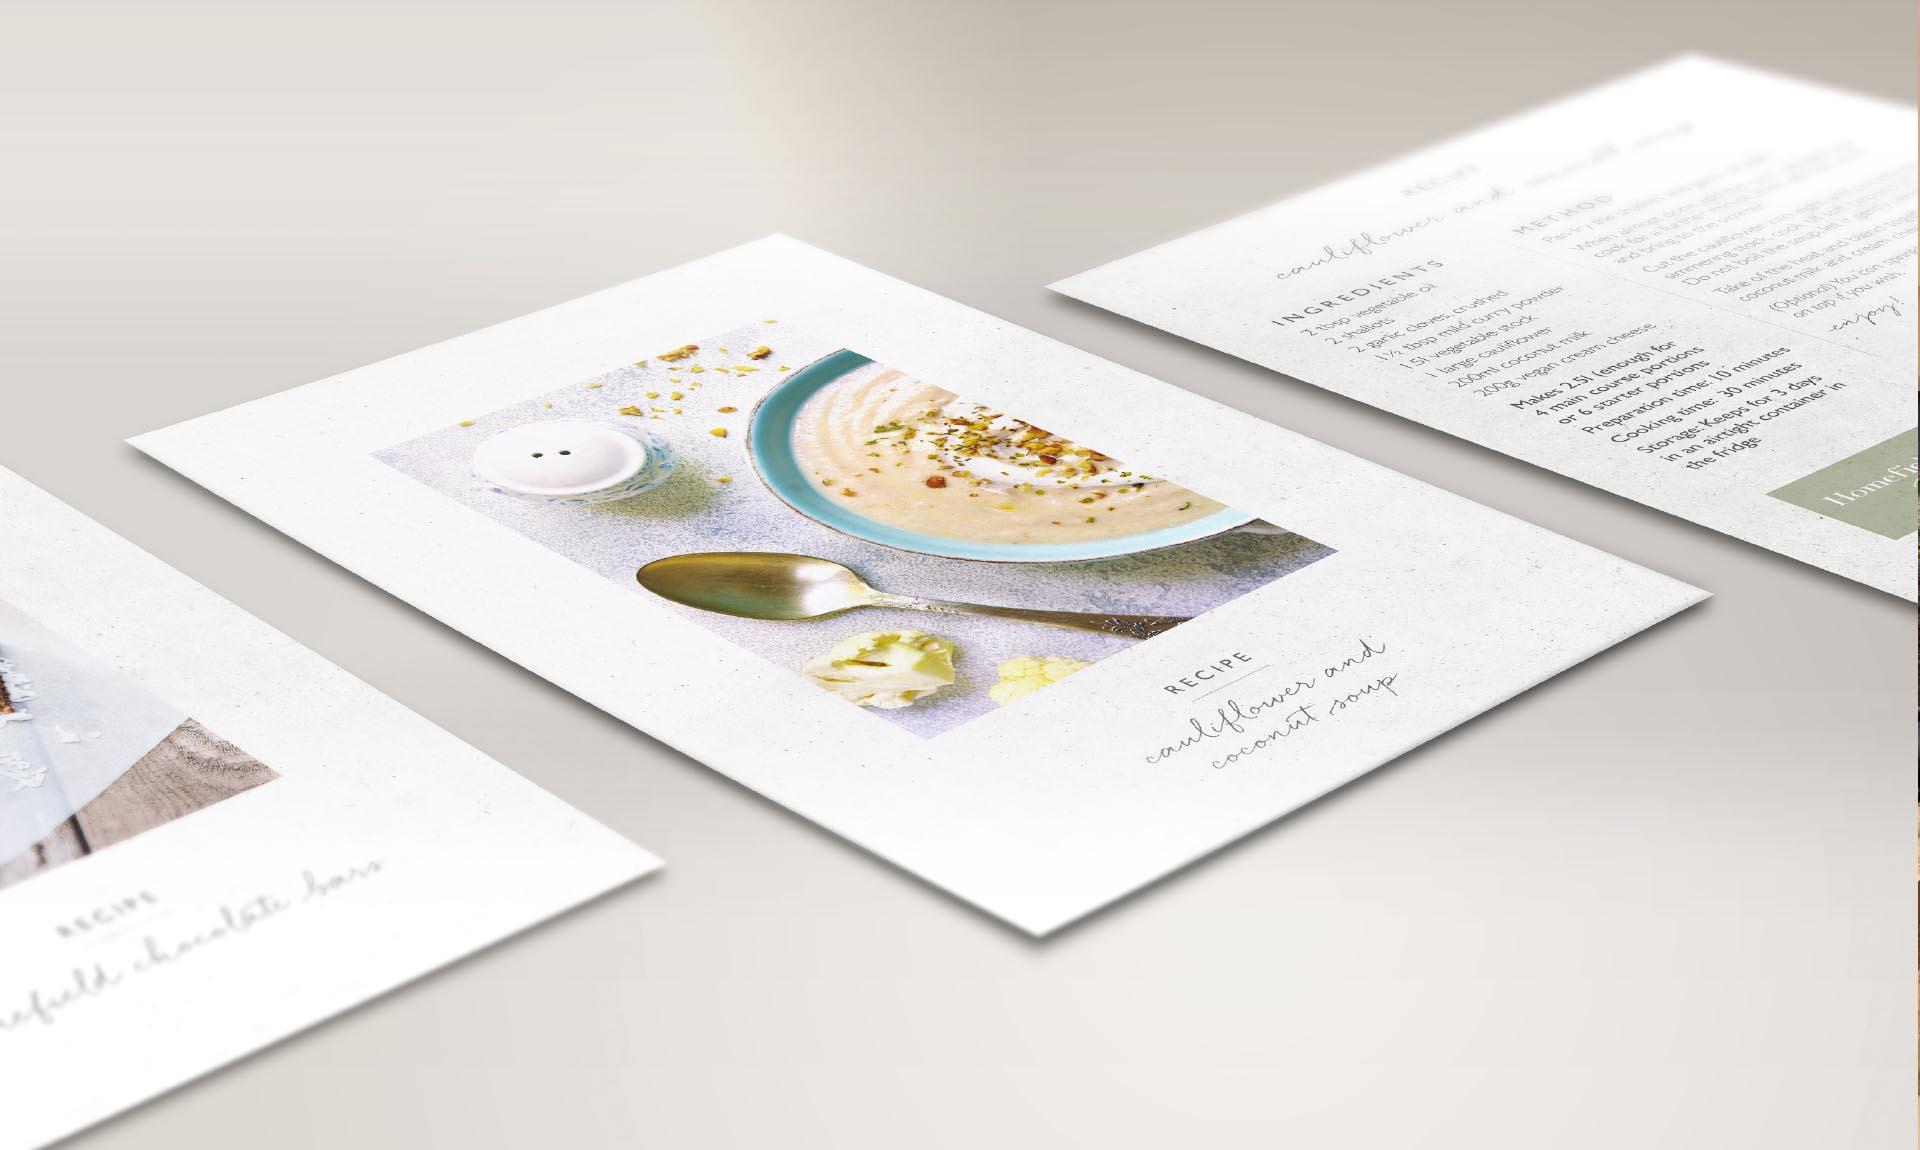 Butterscotch-Design-Homefield-Grange-branding-recipe-cards